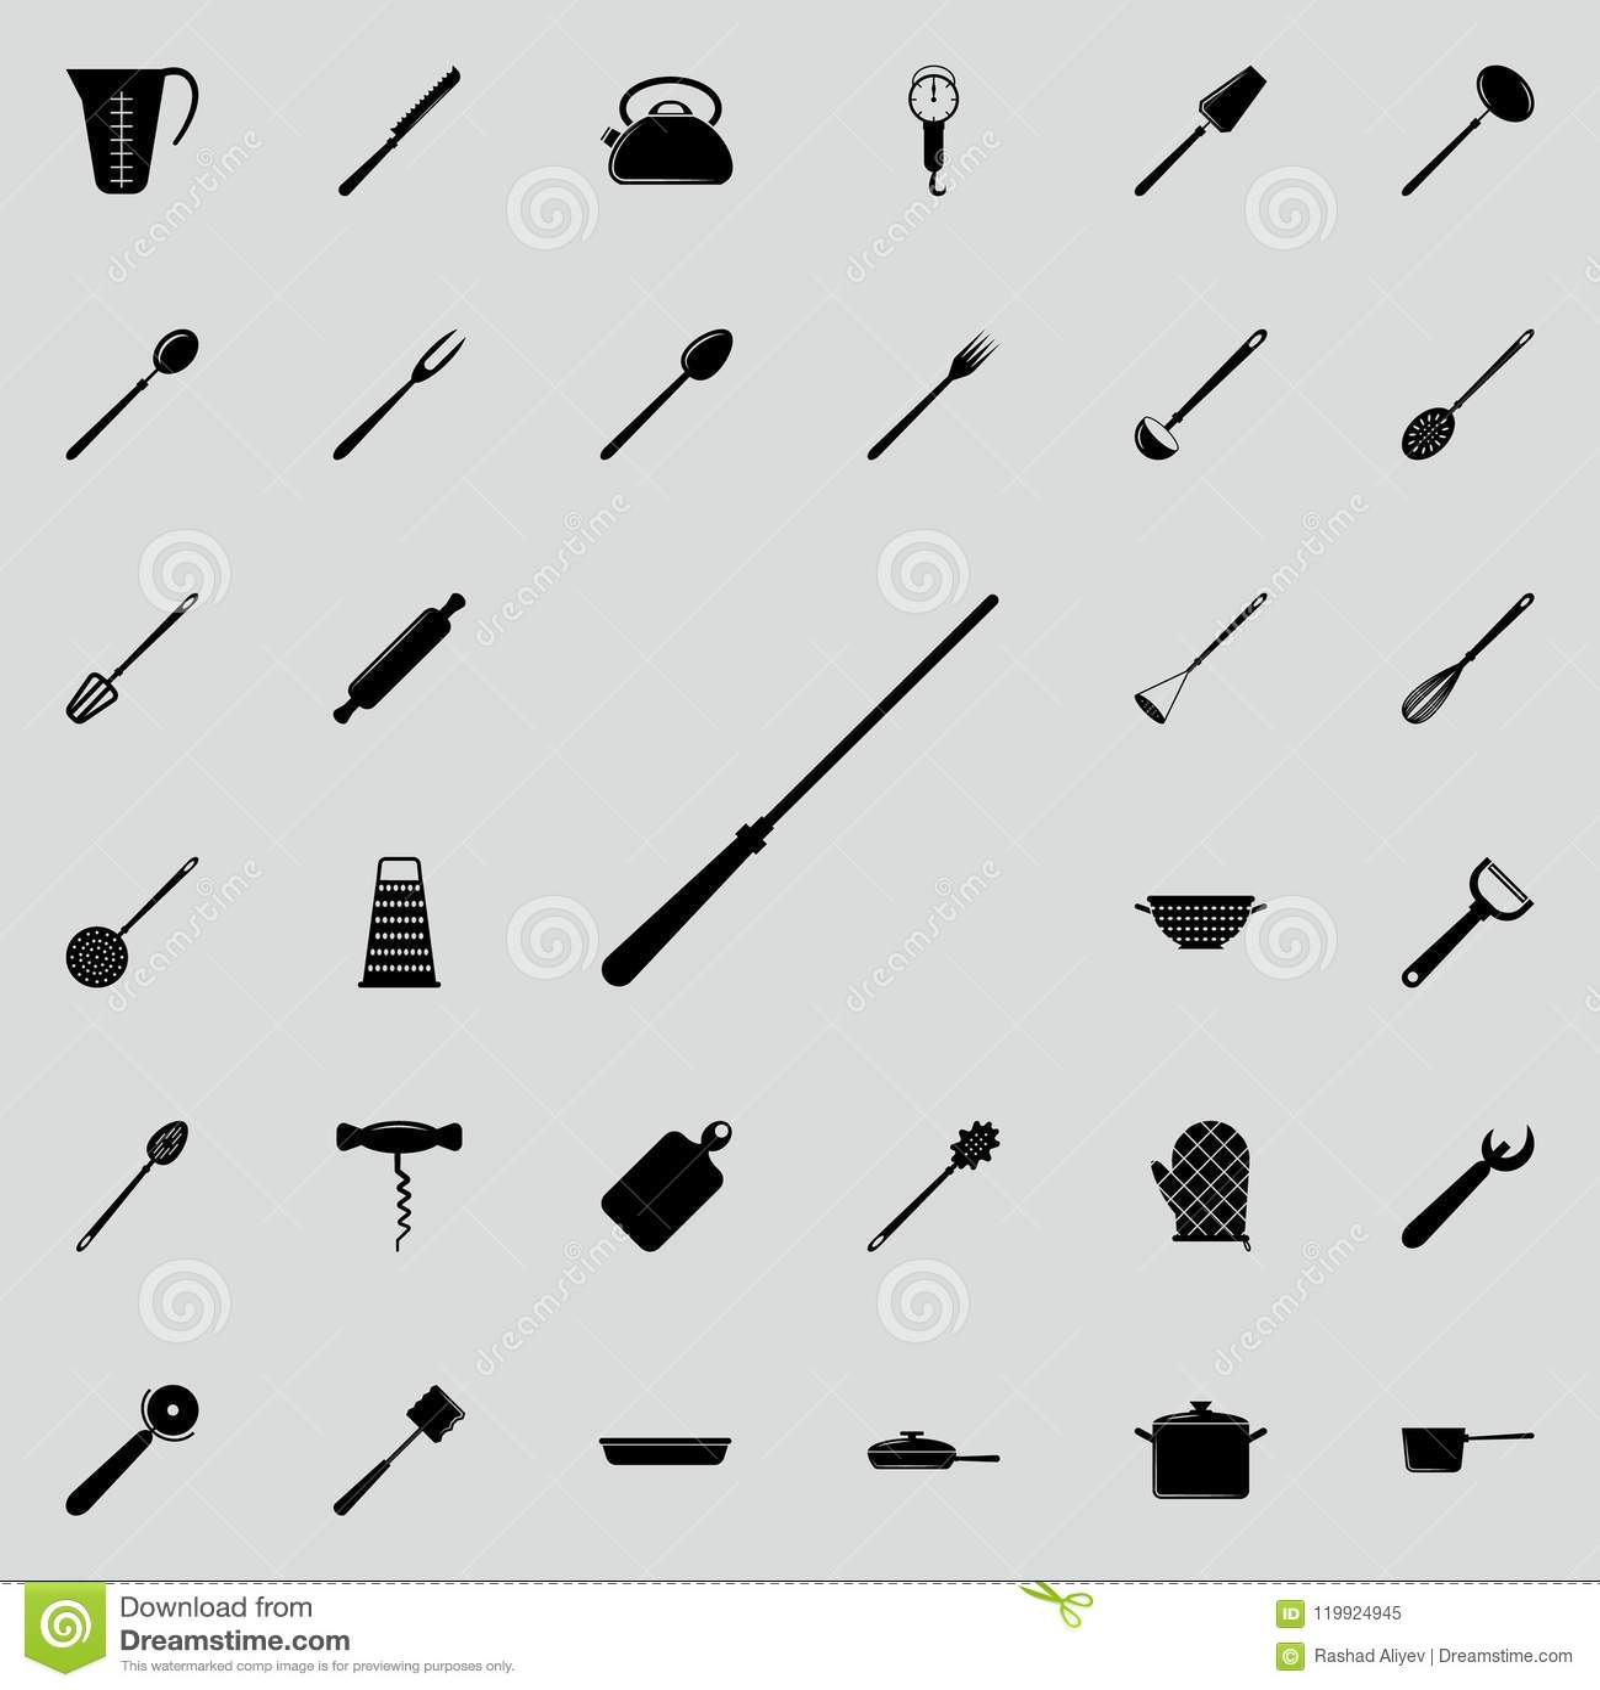 kitchen signs for work toys toddlers 洞穴象详细的套厨房用工具加工象优质质量图形设计标志其中一个网站的汇集 洞穴象详细的套厨房用工具加工象优质质量图形设计标志其中